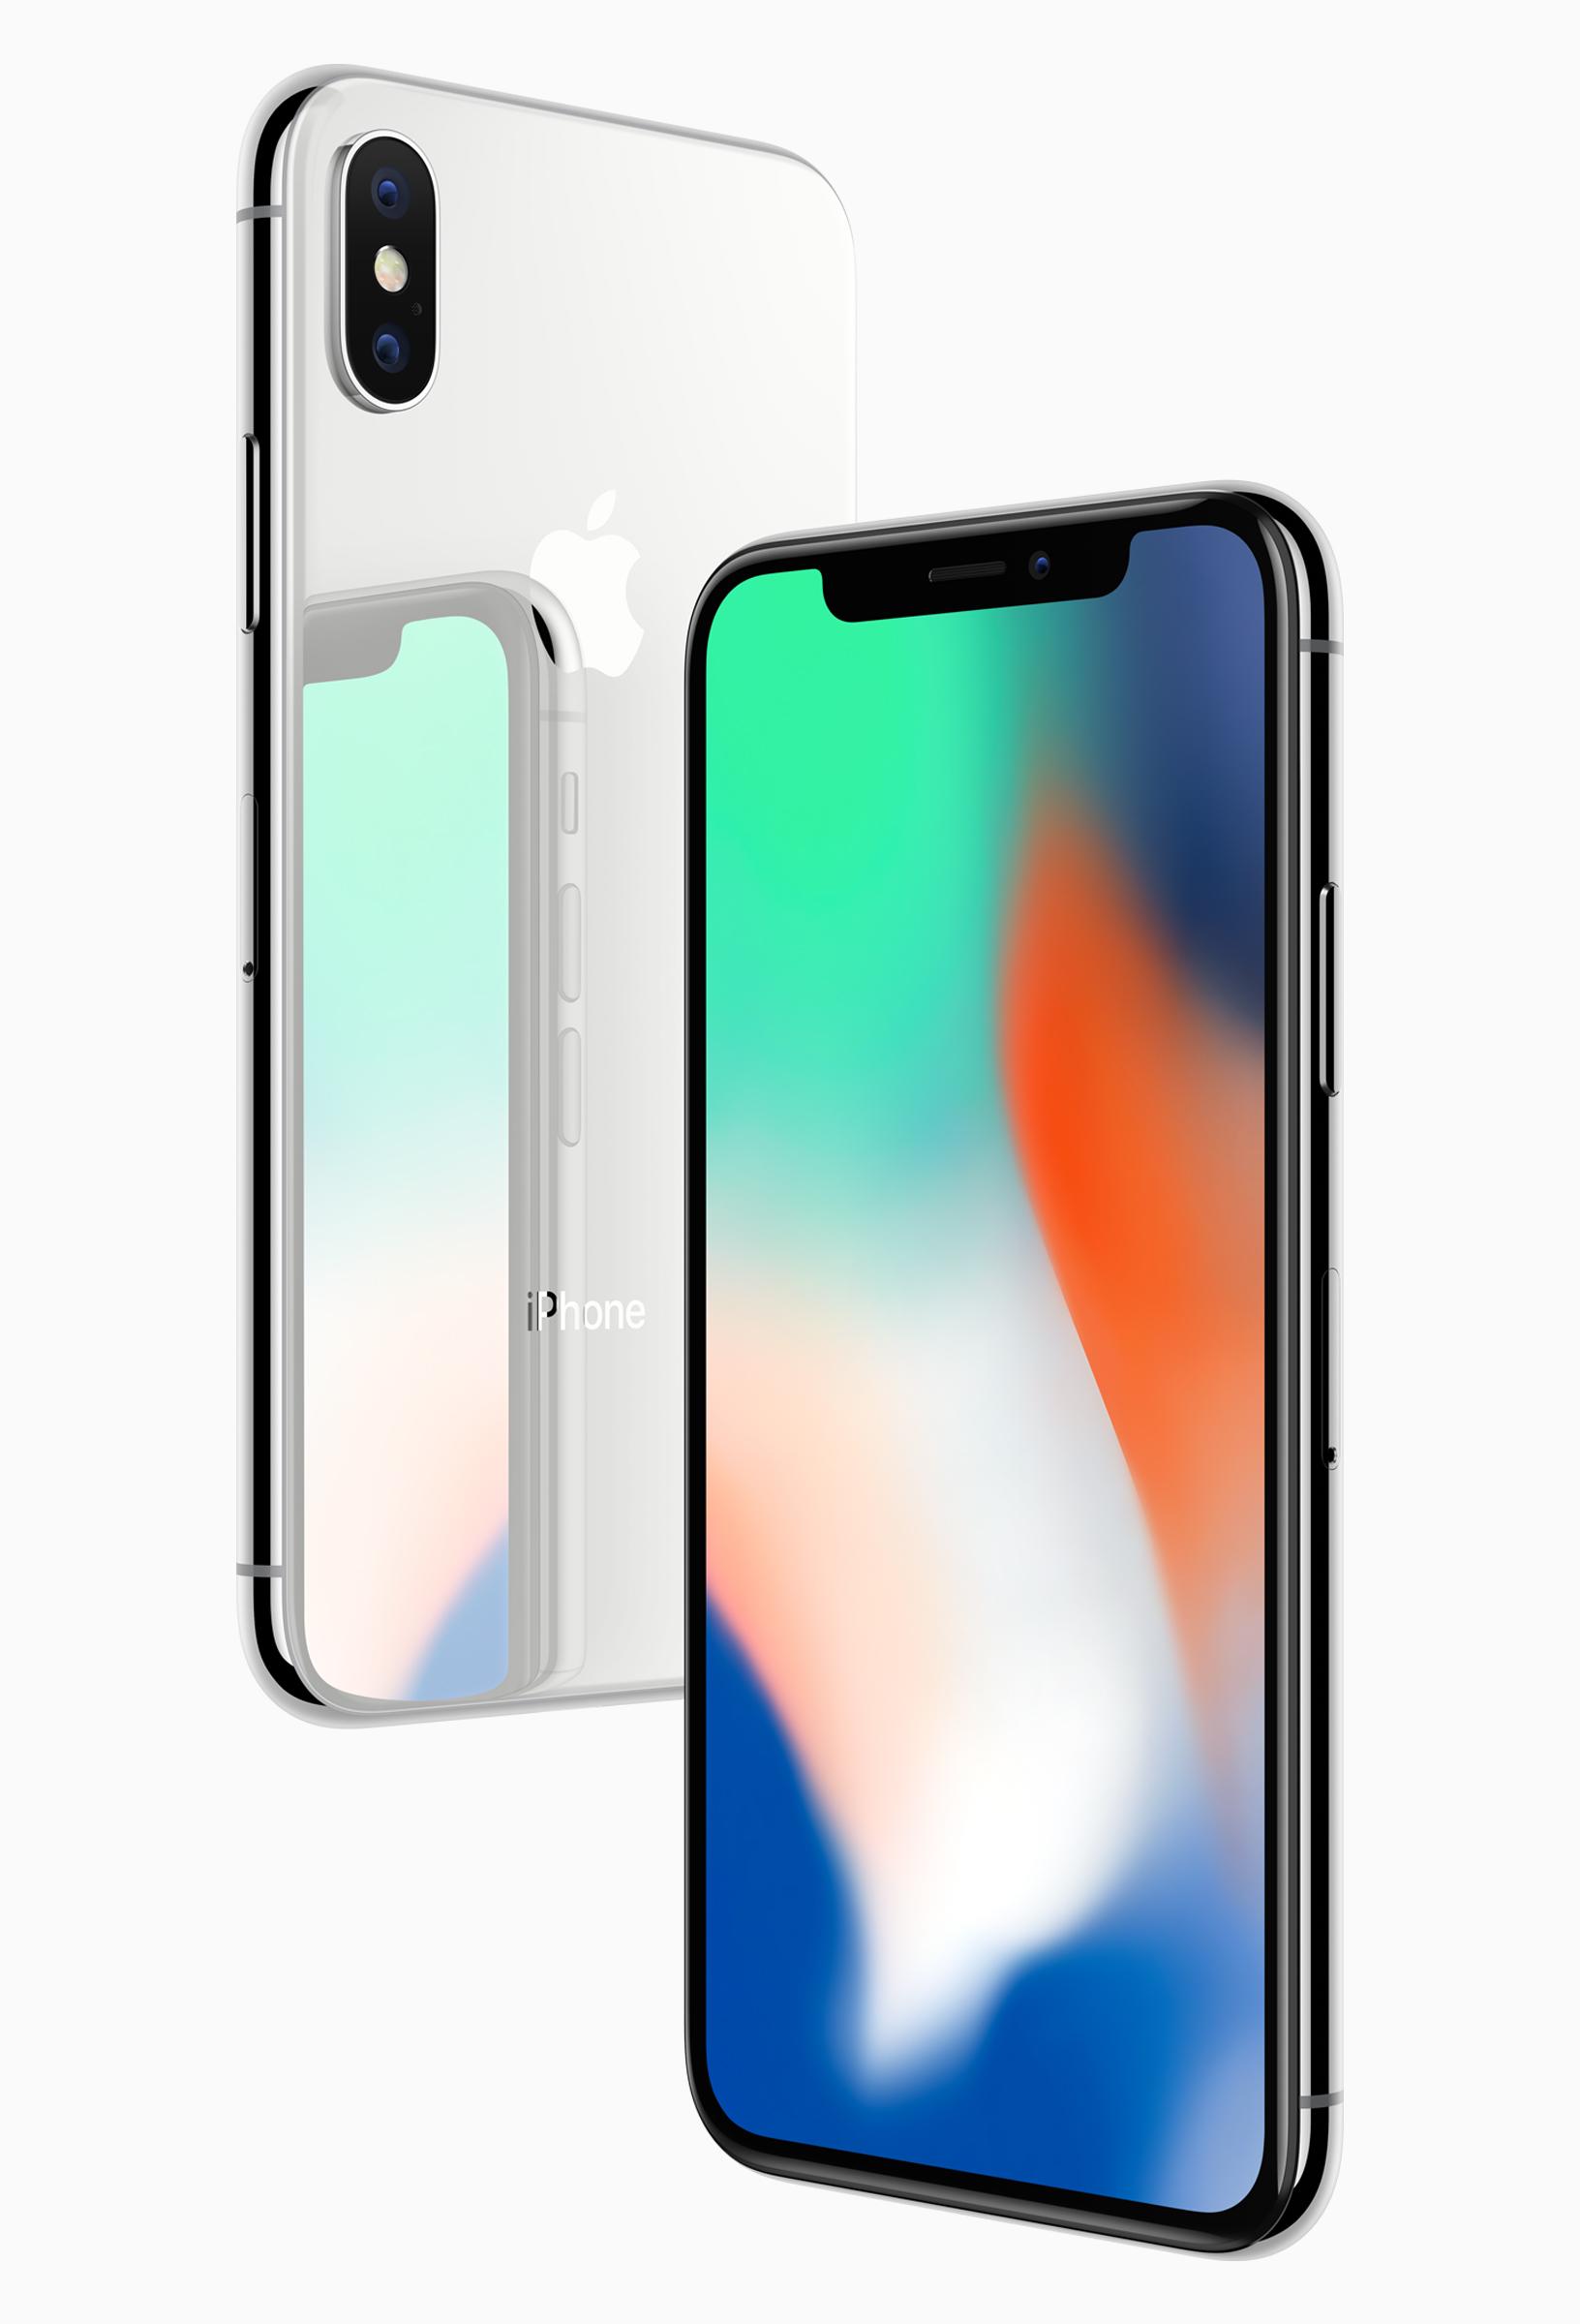 iPhone X to Boast 3GB of RAM, 2,716mAh Battery